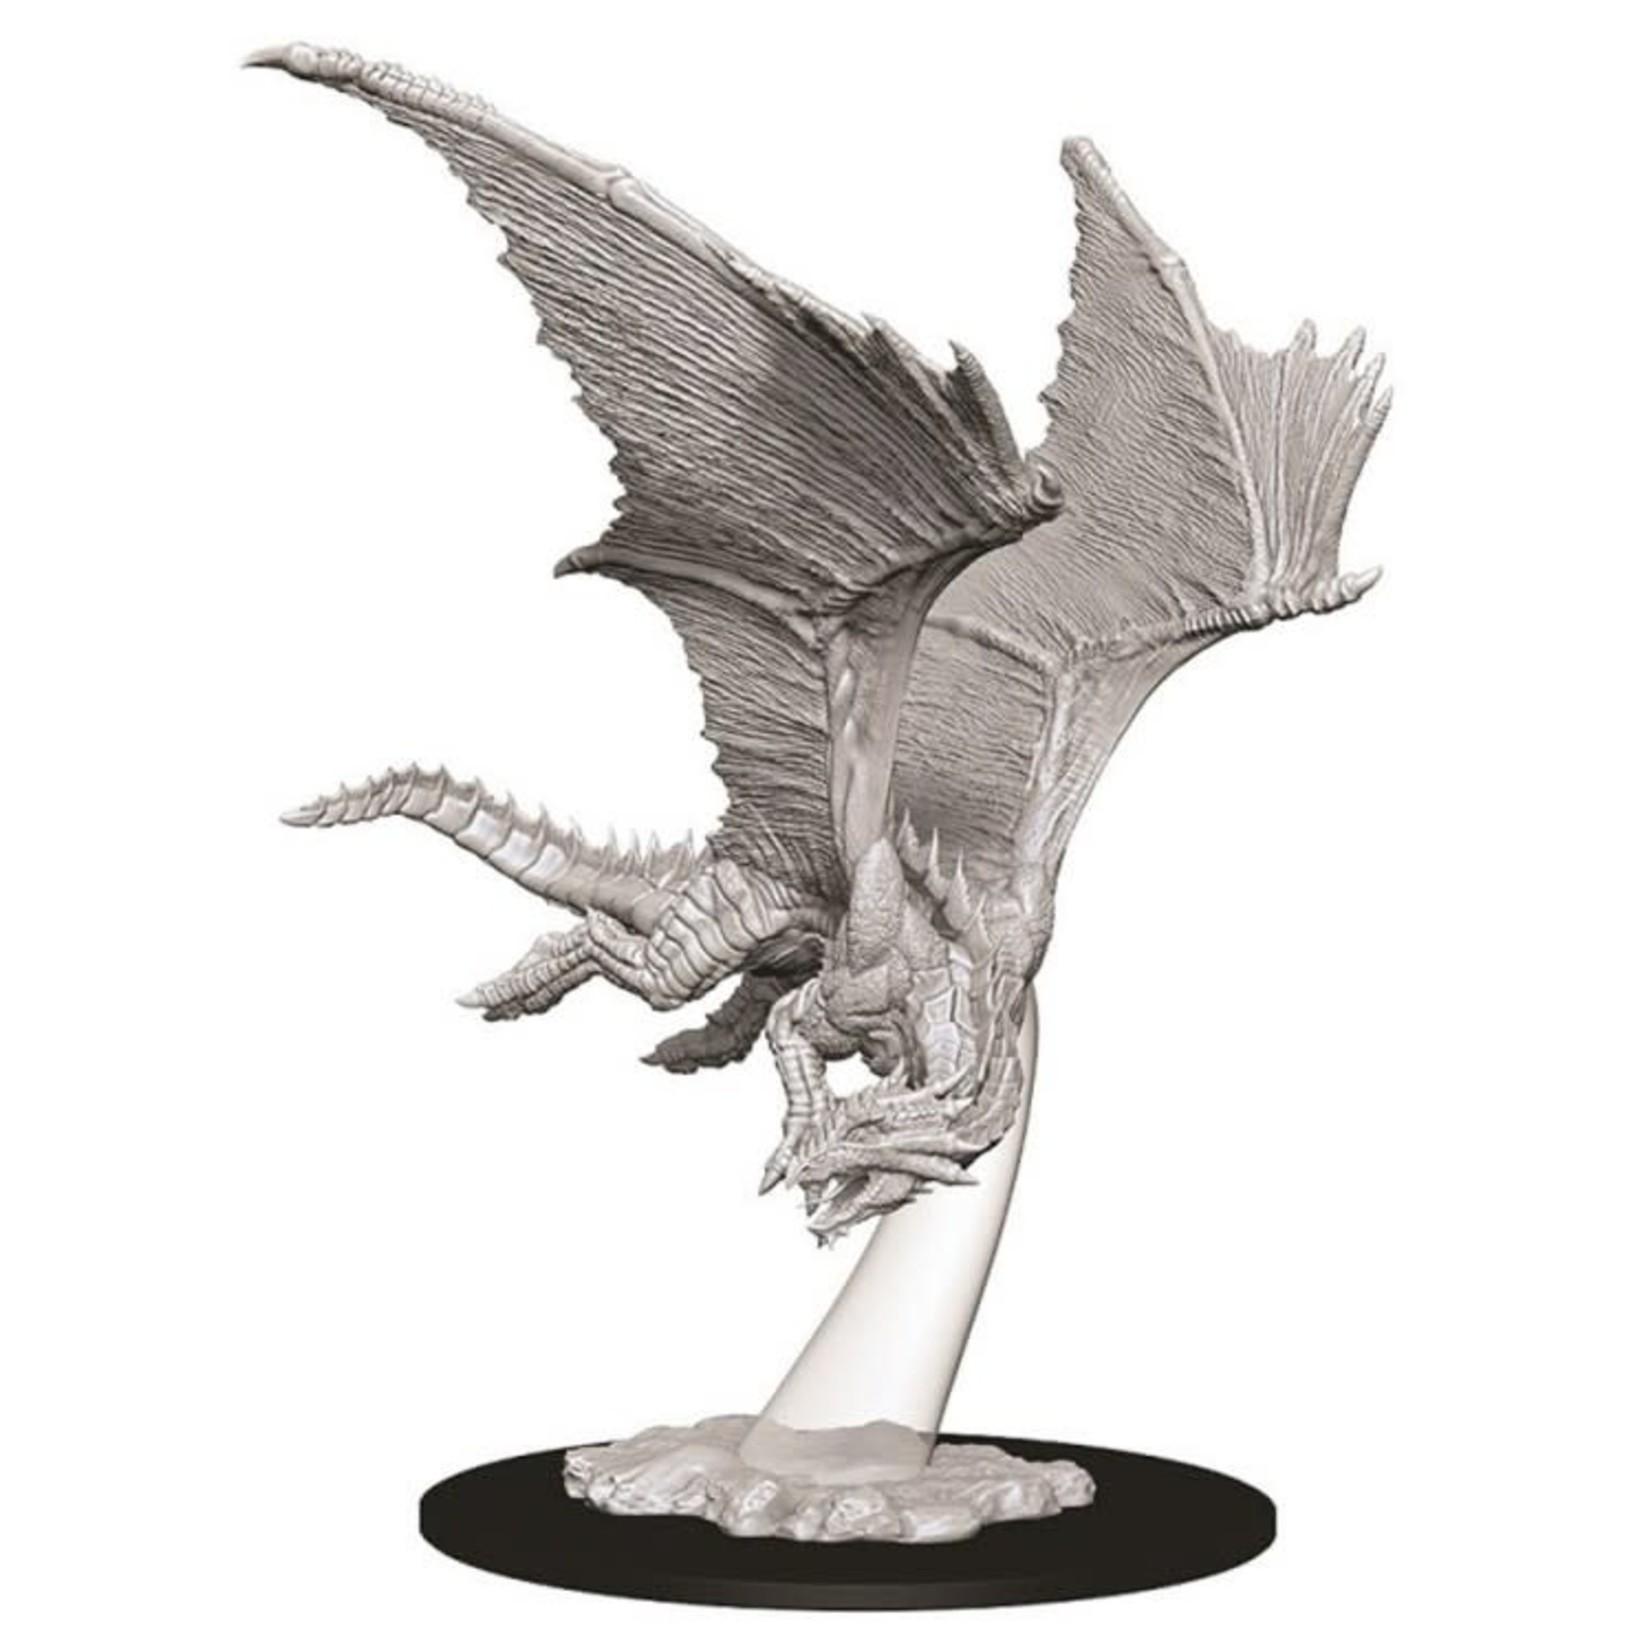 WizKids/Neca 73710 Nolzur's Young Bronze Dragon